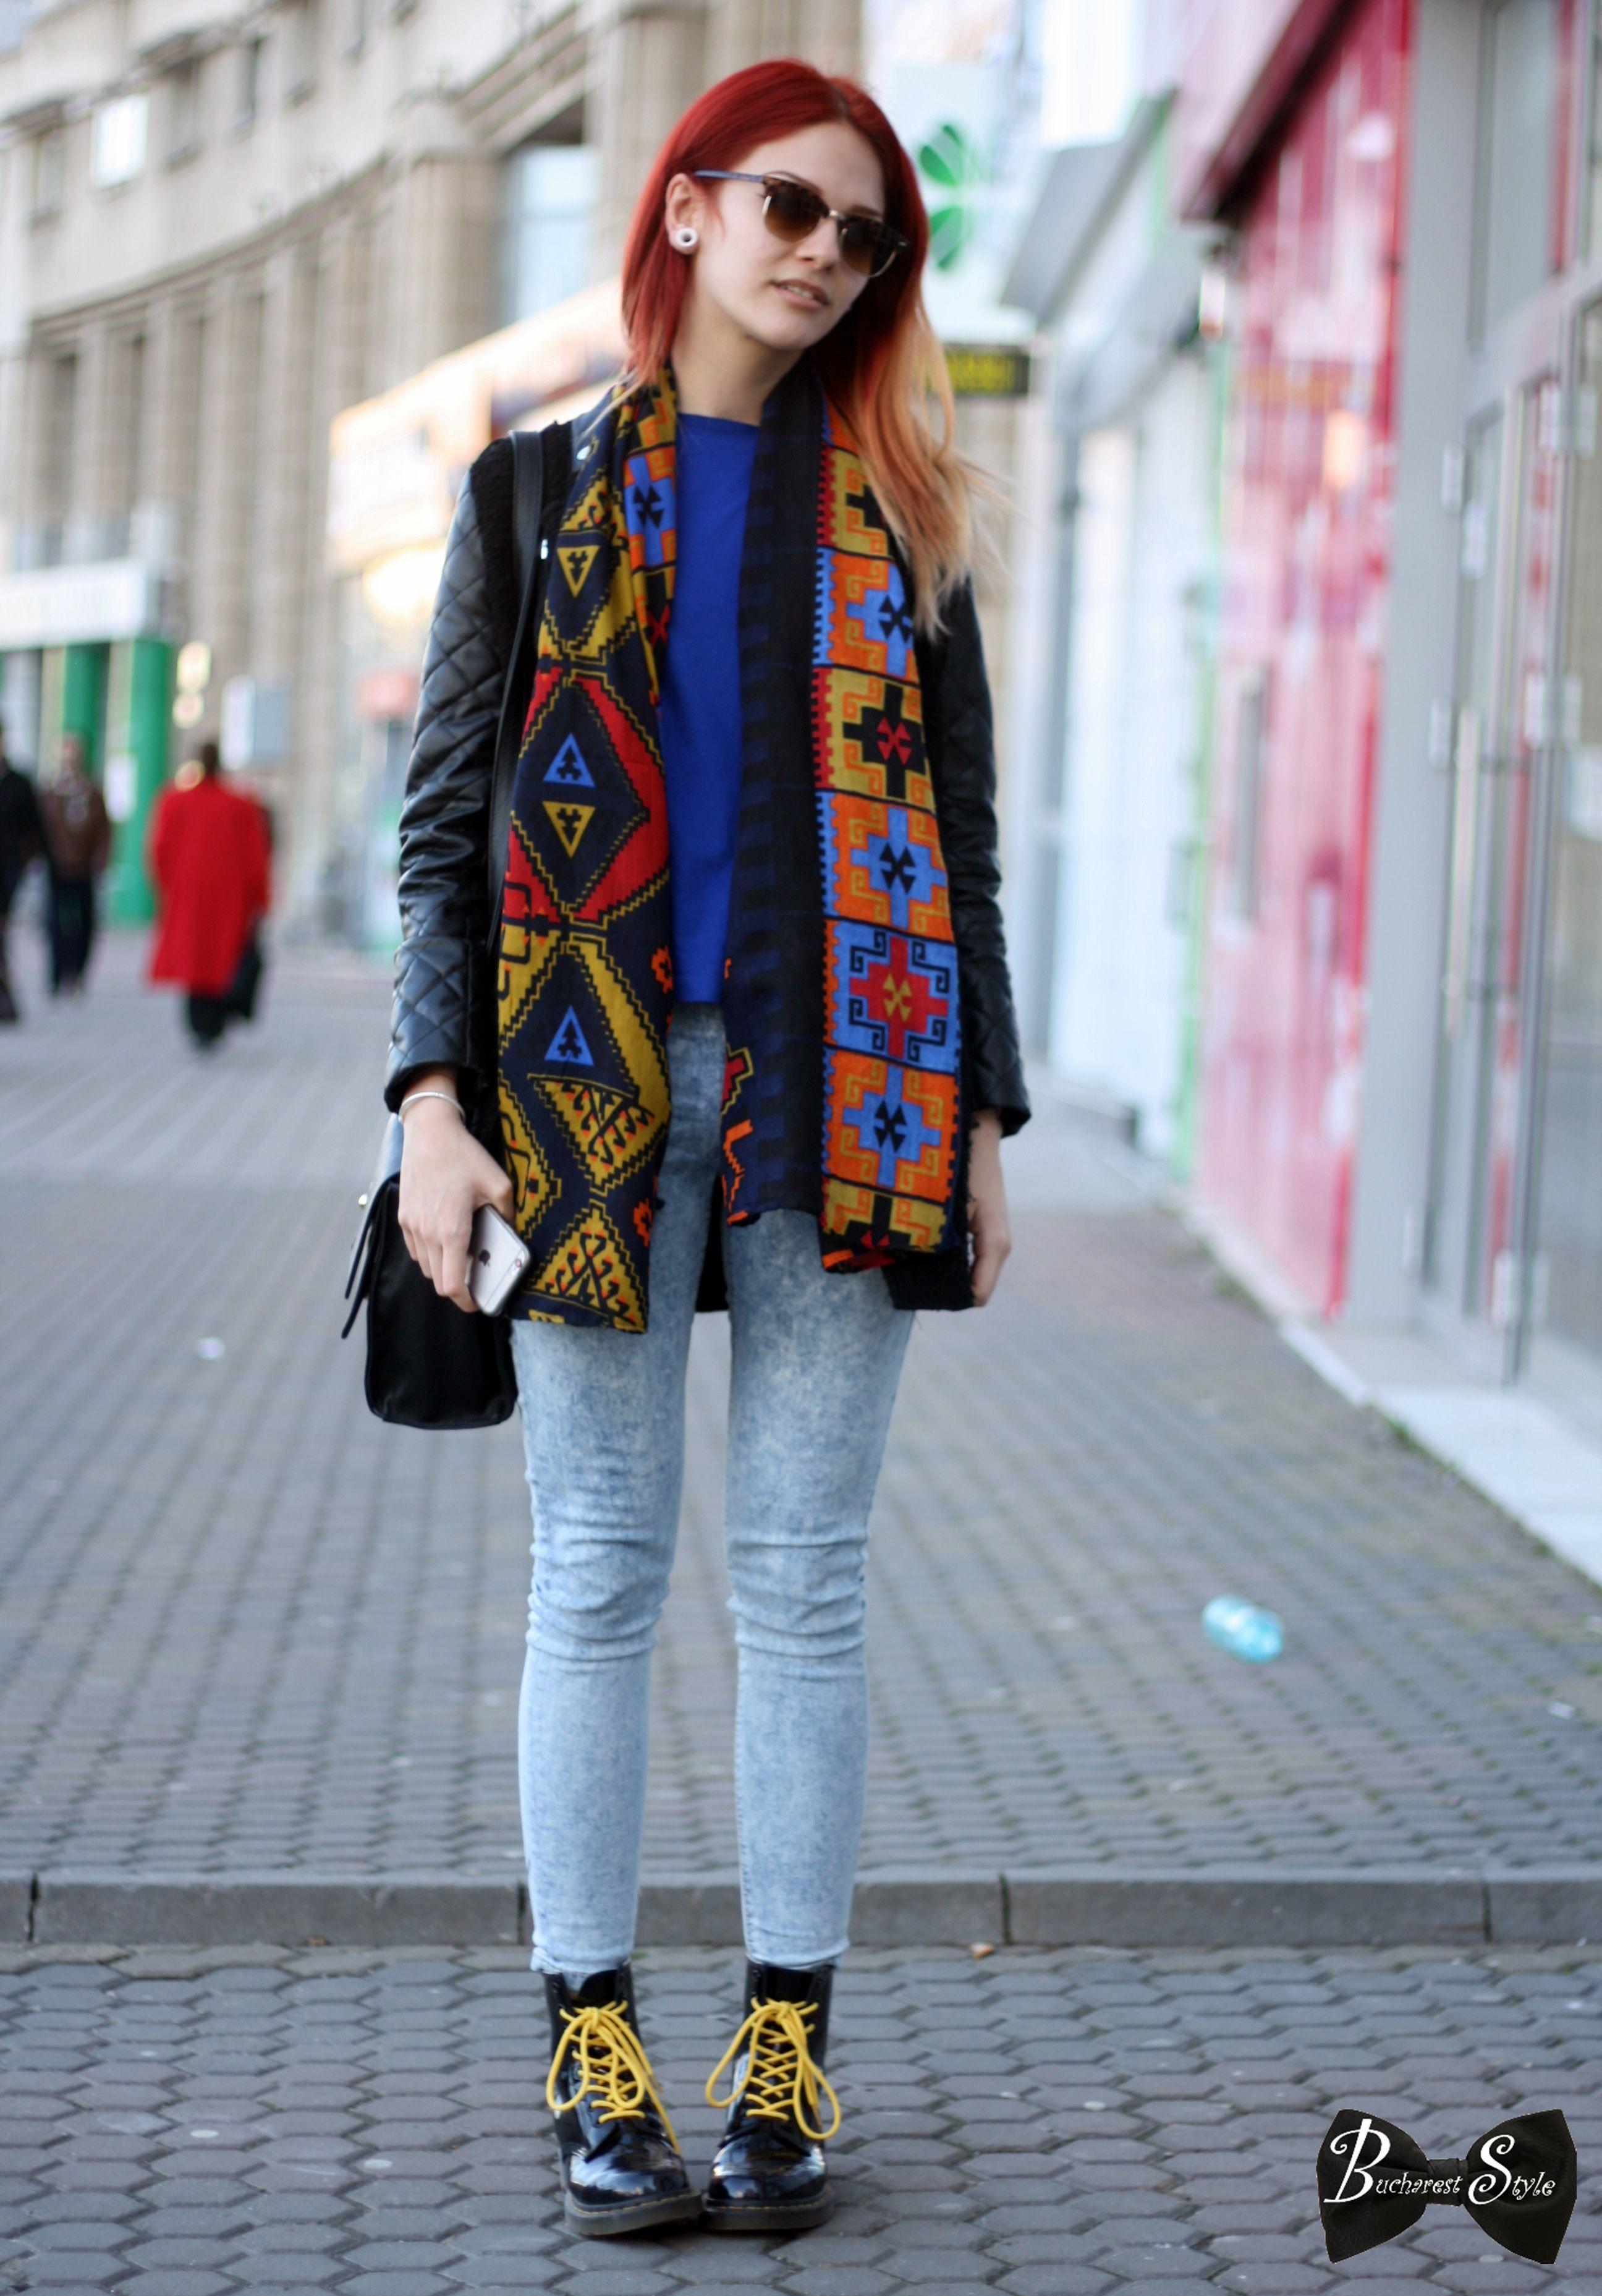 bucharest style street style colors print romania street style romania street fashion